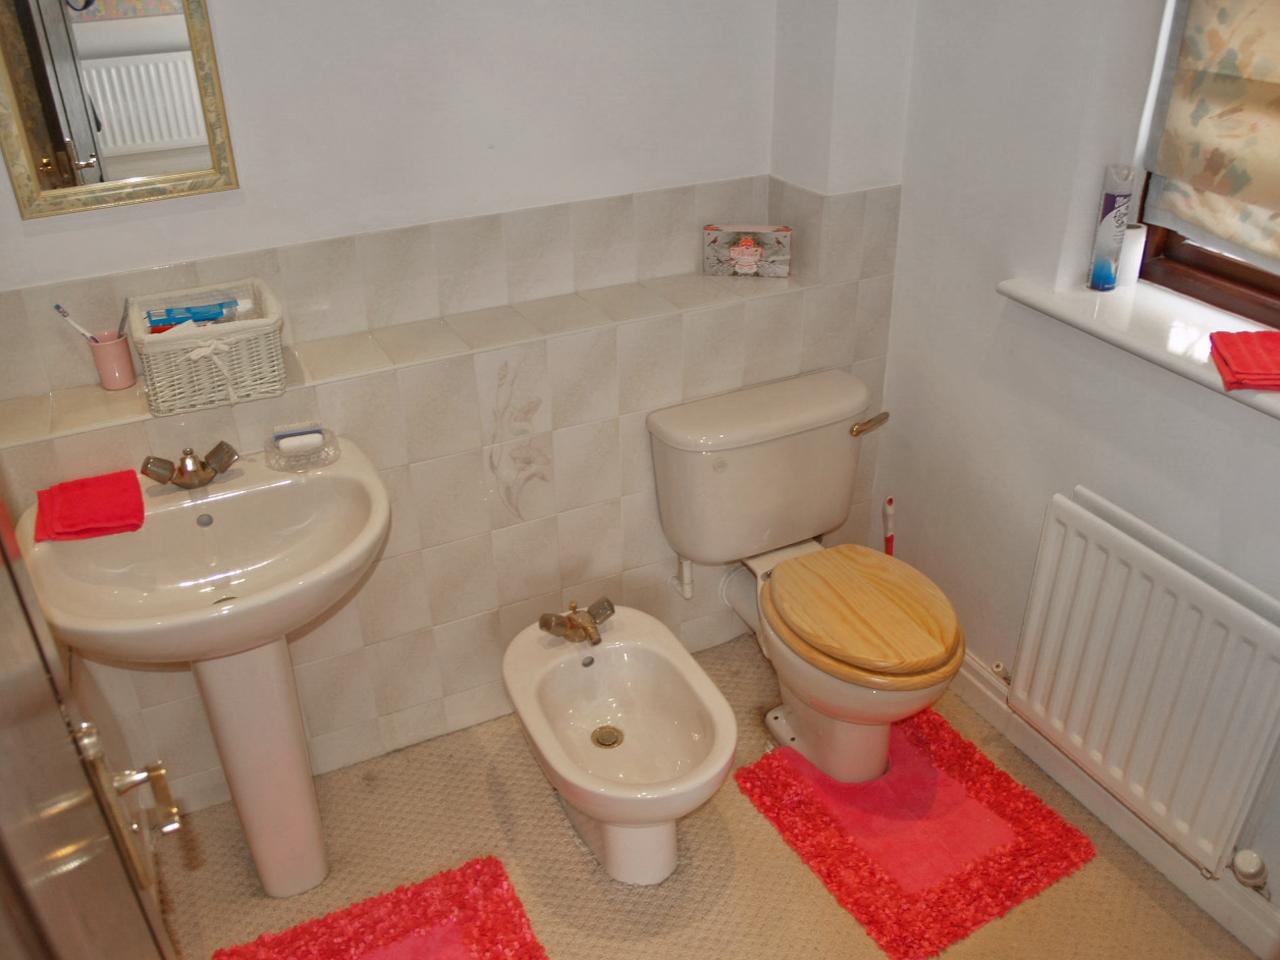 4 bedroom detached house SSTC in Birmingham - photograph 12.